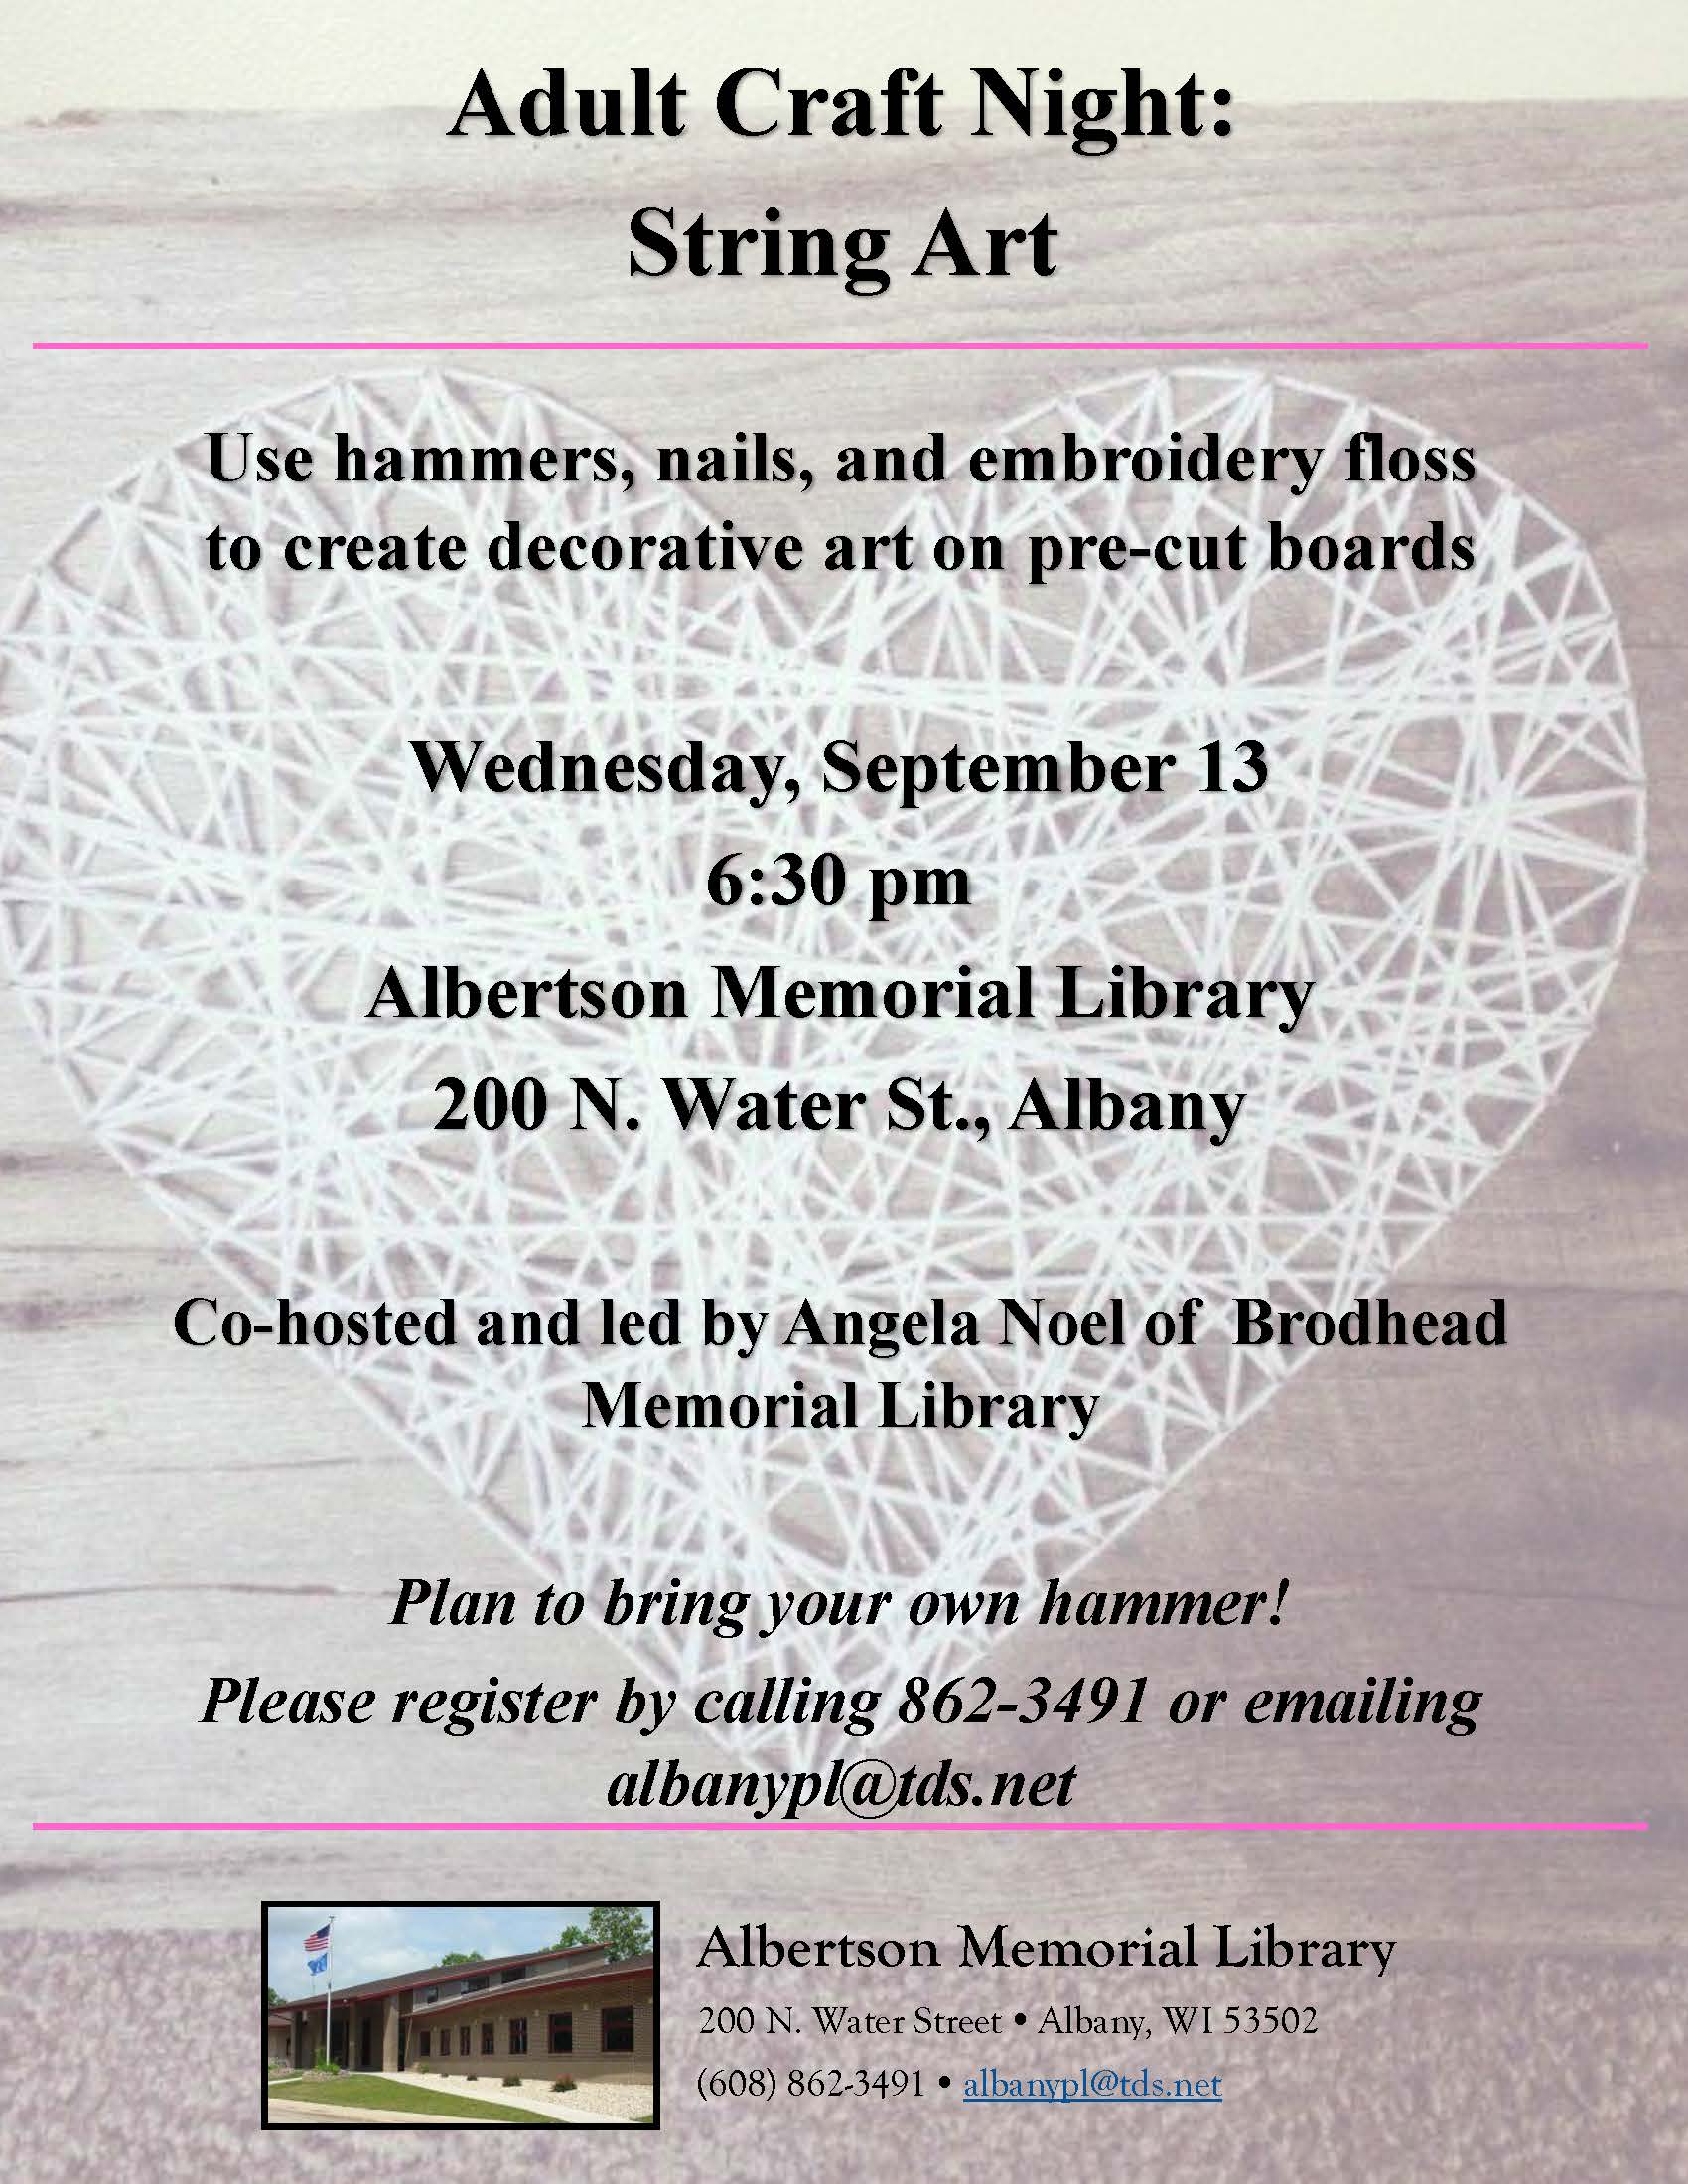 Adult Craft: String Art | Albertson Memorial Library